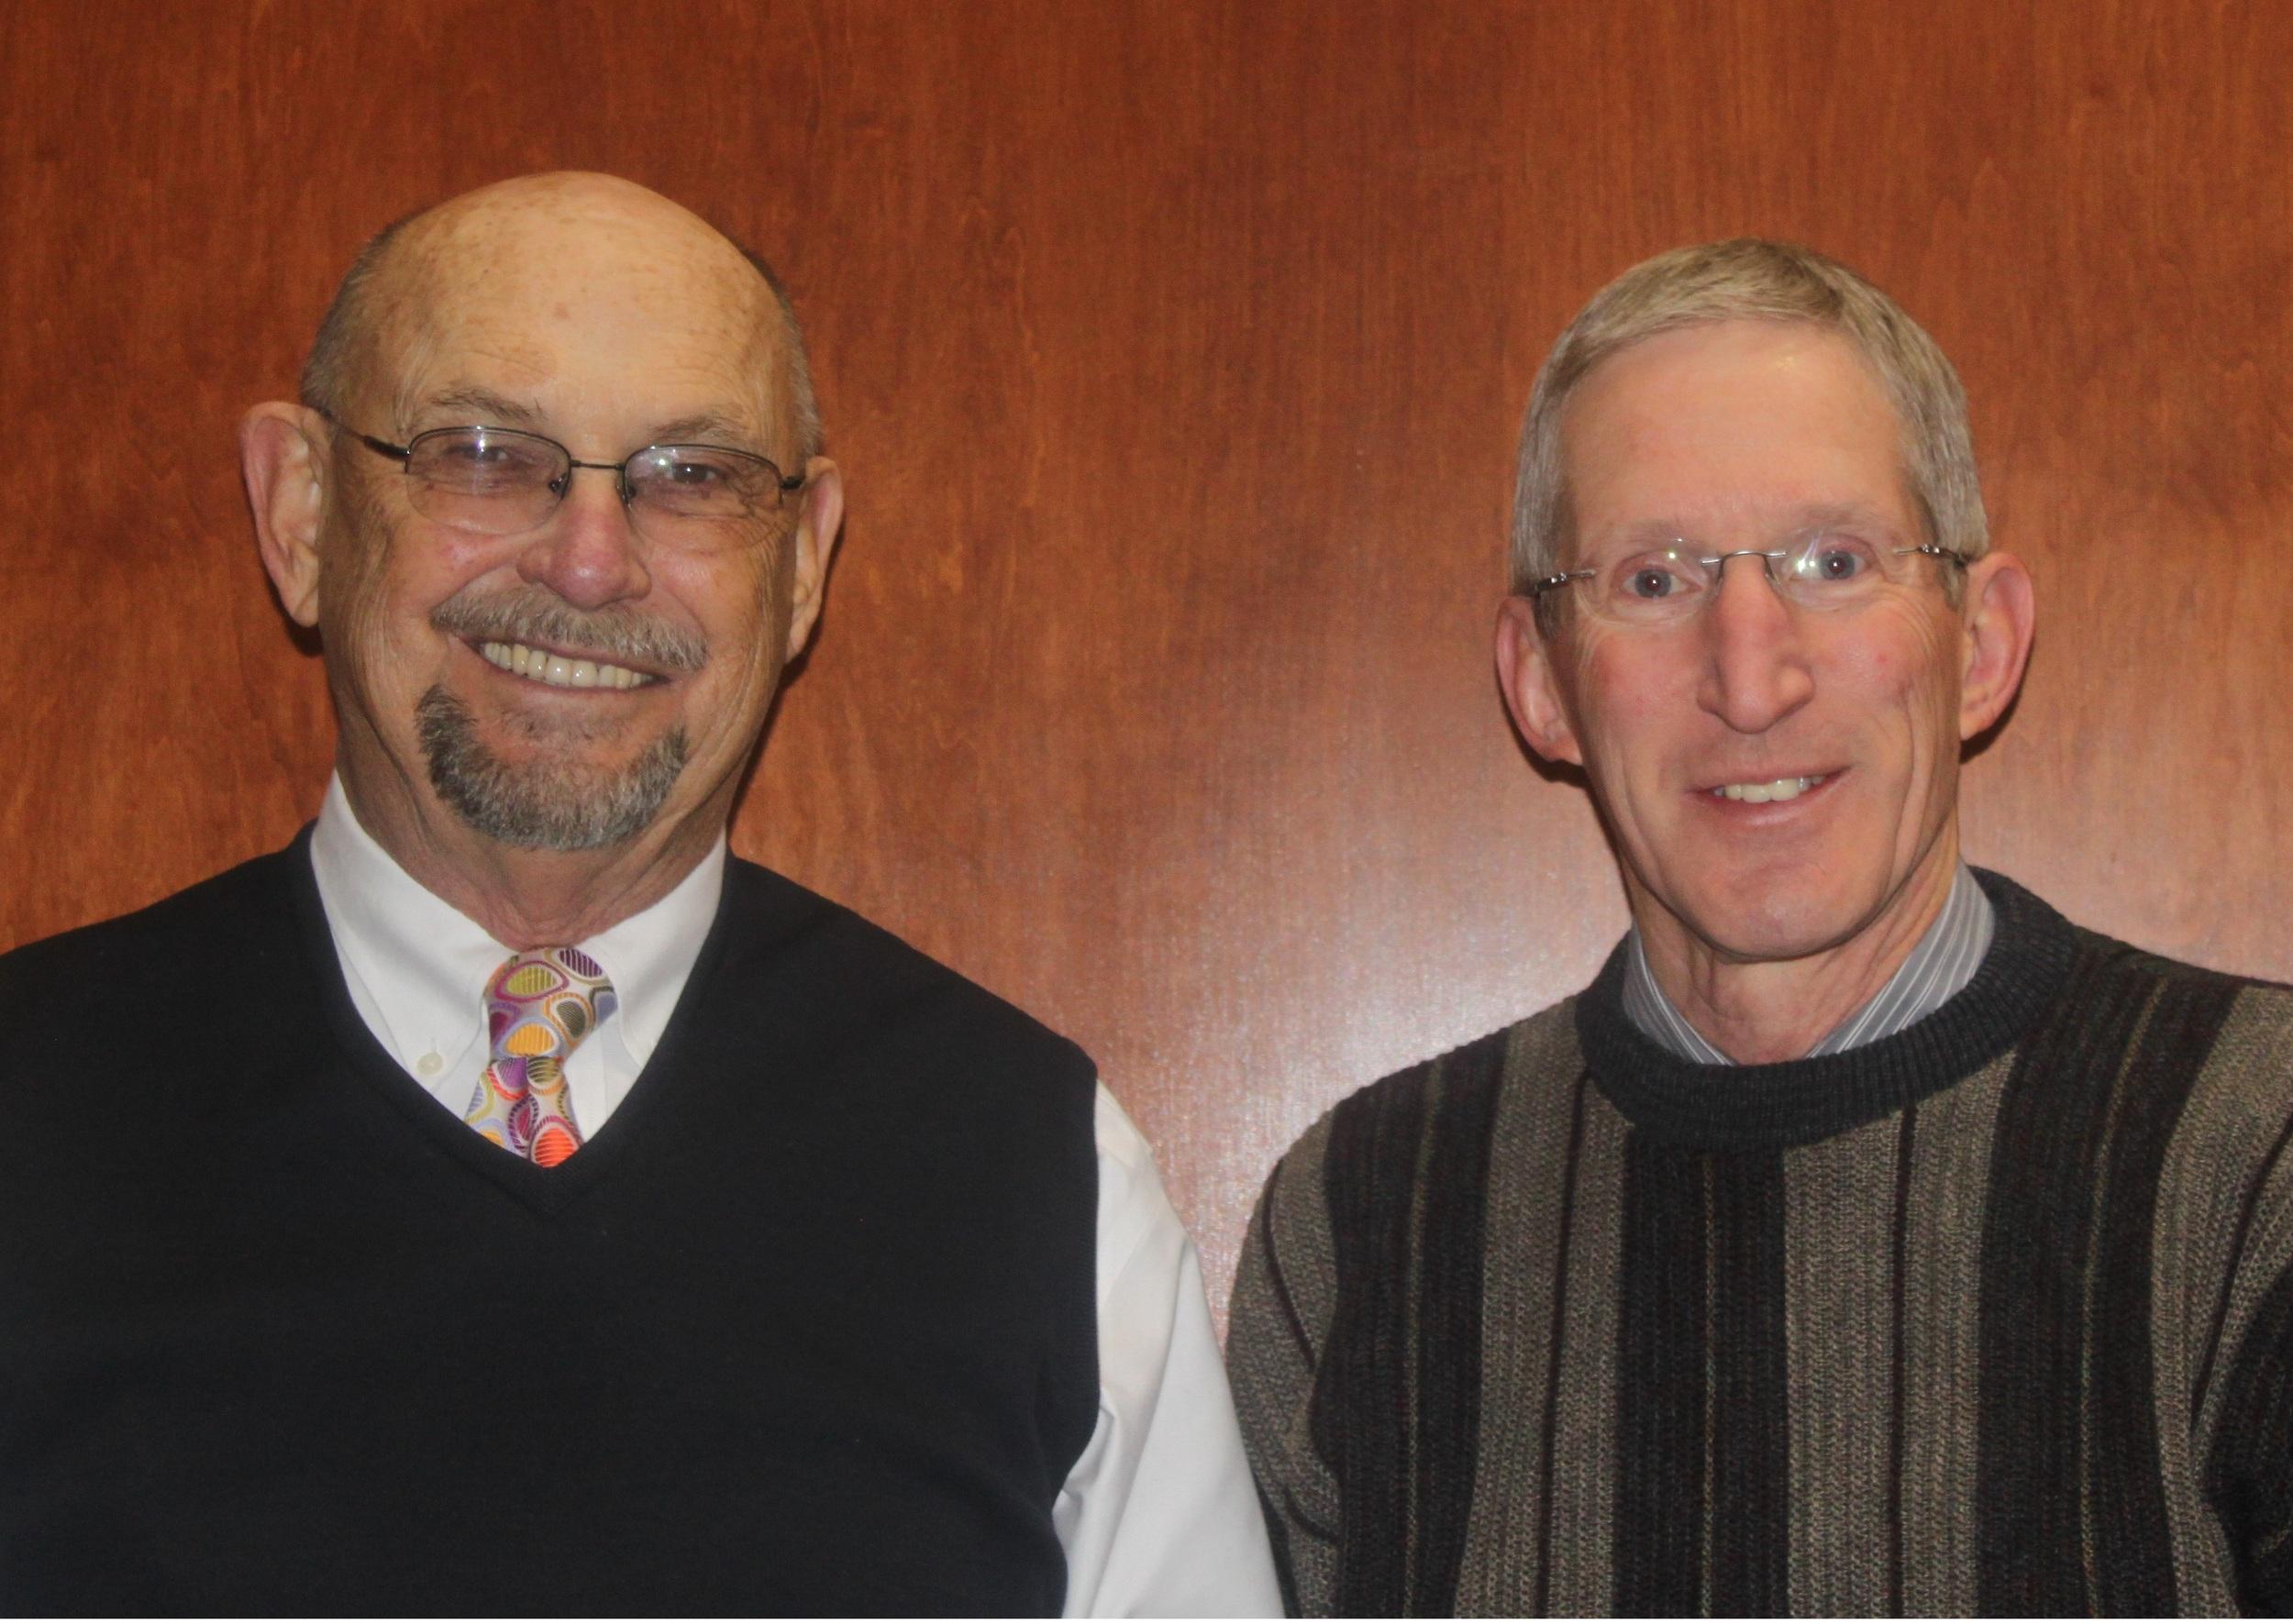 Your Hosts: Jerry Nelson & GARY  SHUGART